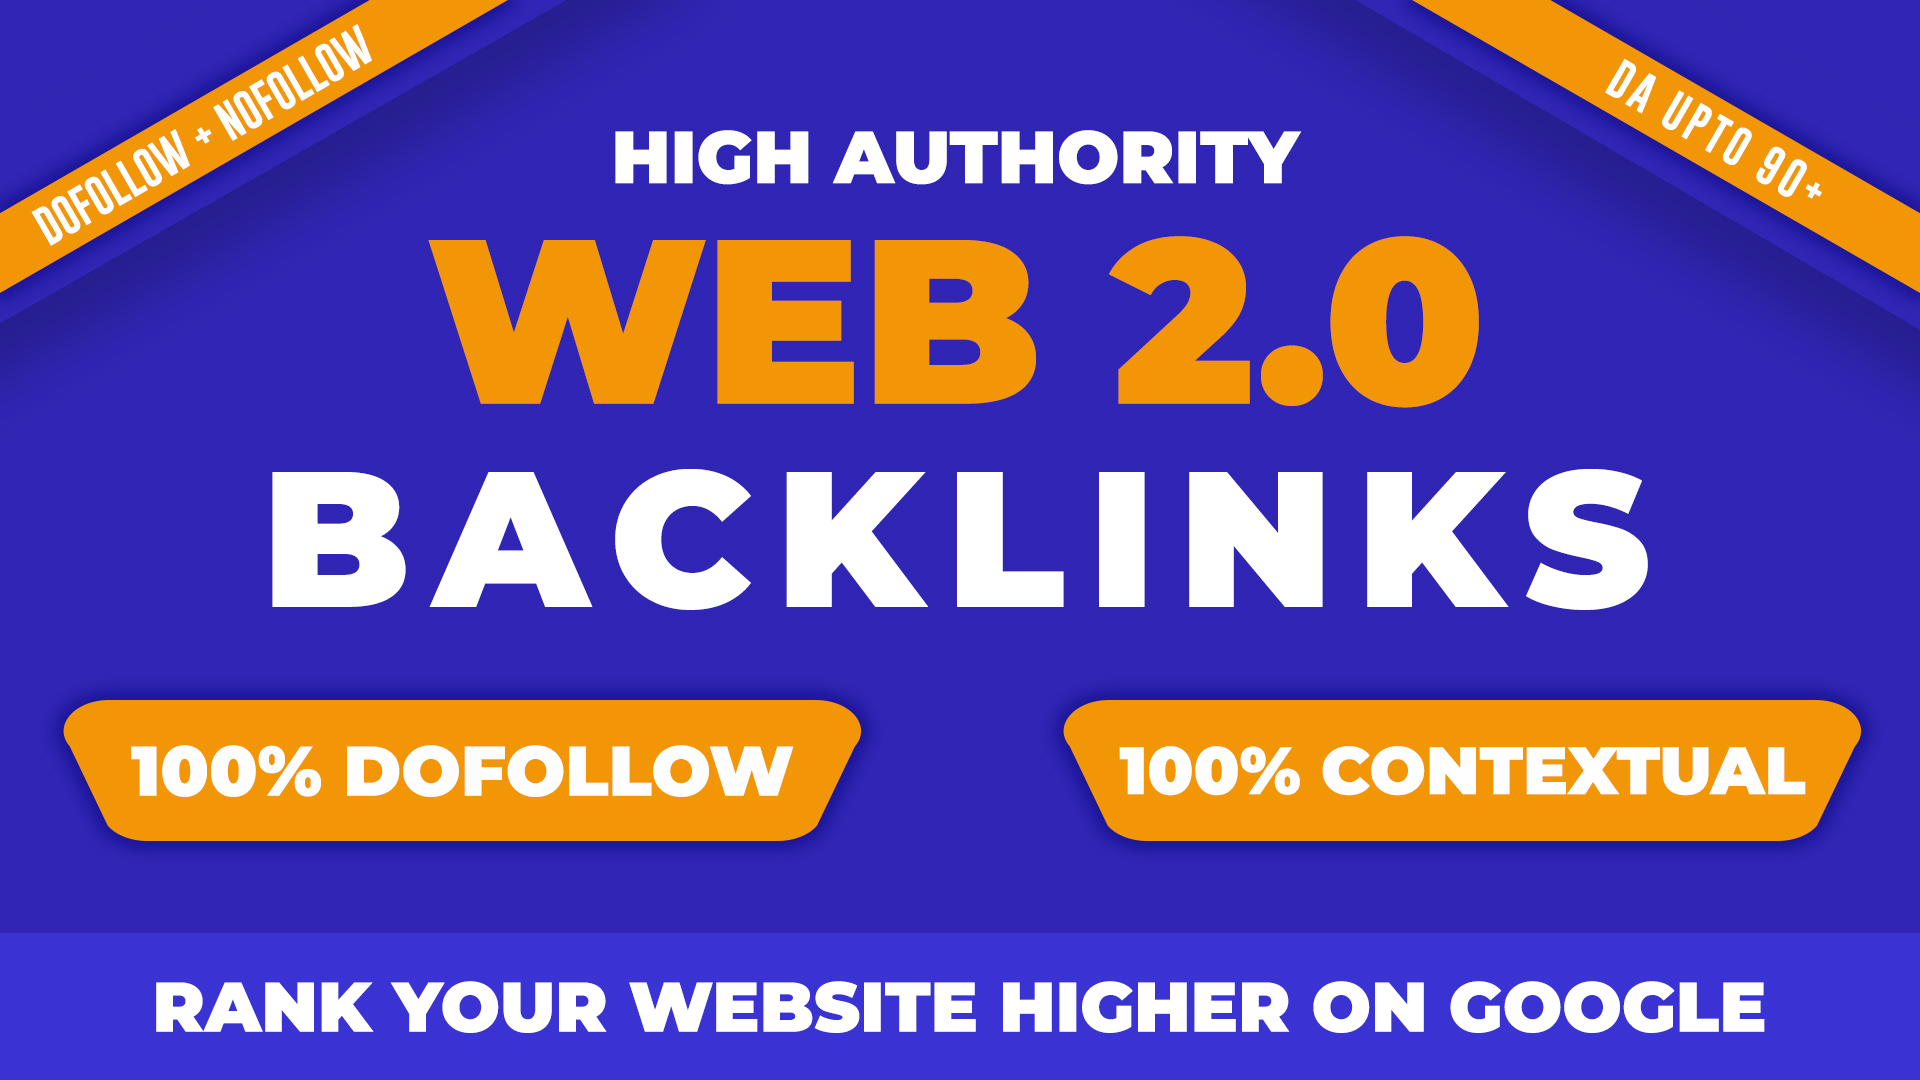 I will create 60 web 2.0 profile backlinks manually